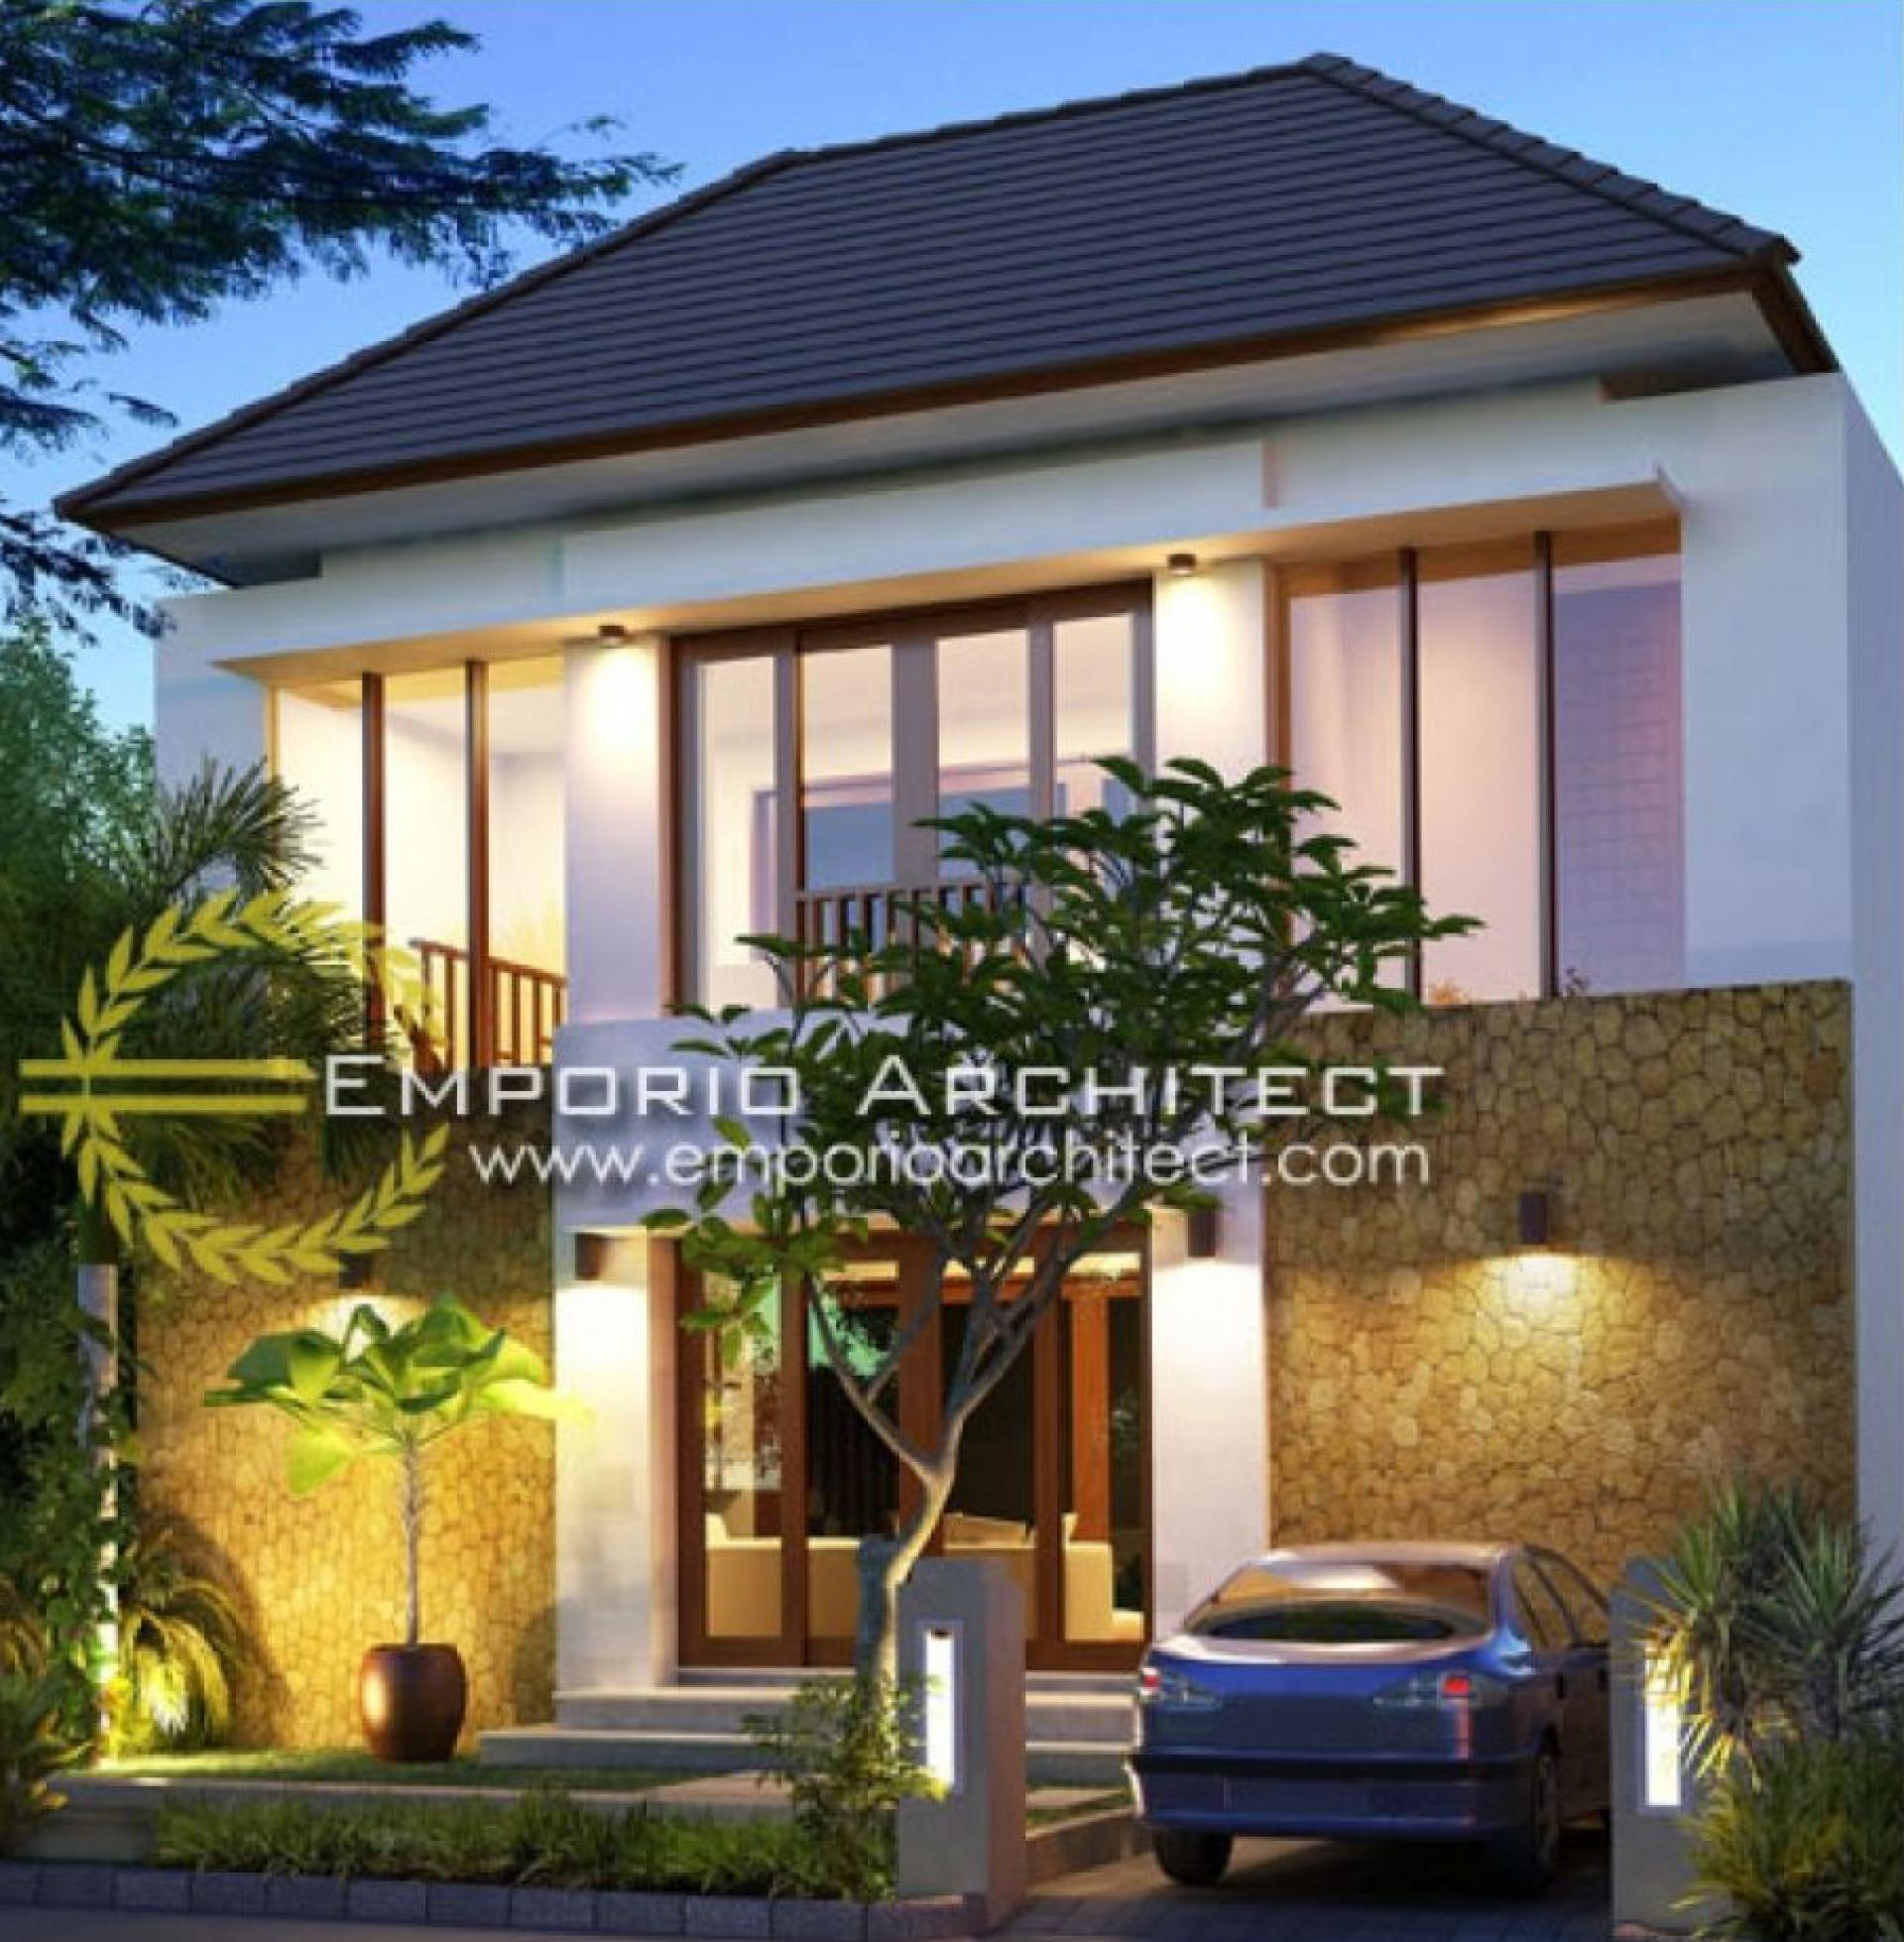 Mr. Dewa Villa Bali House 2 Floors Design - Badung, Bali